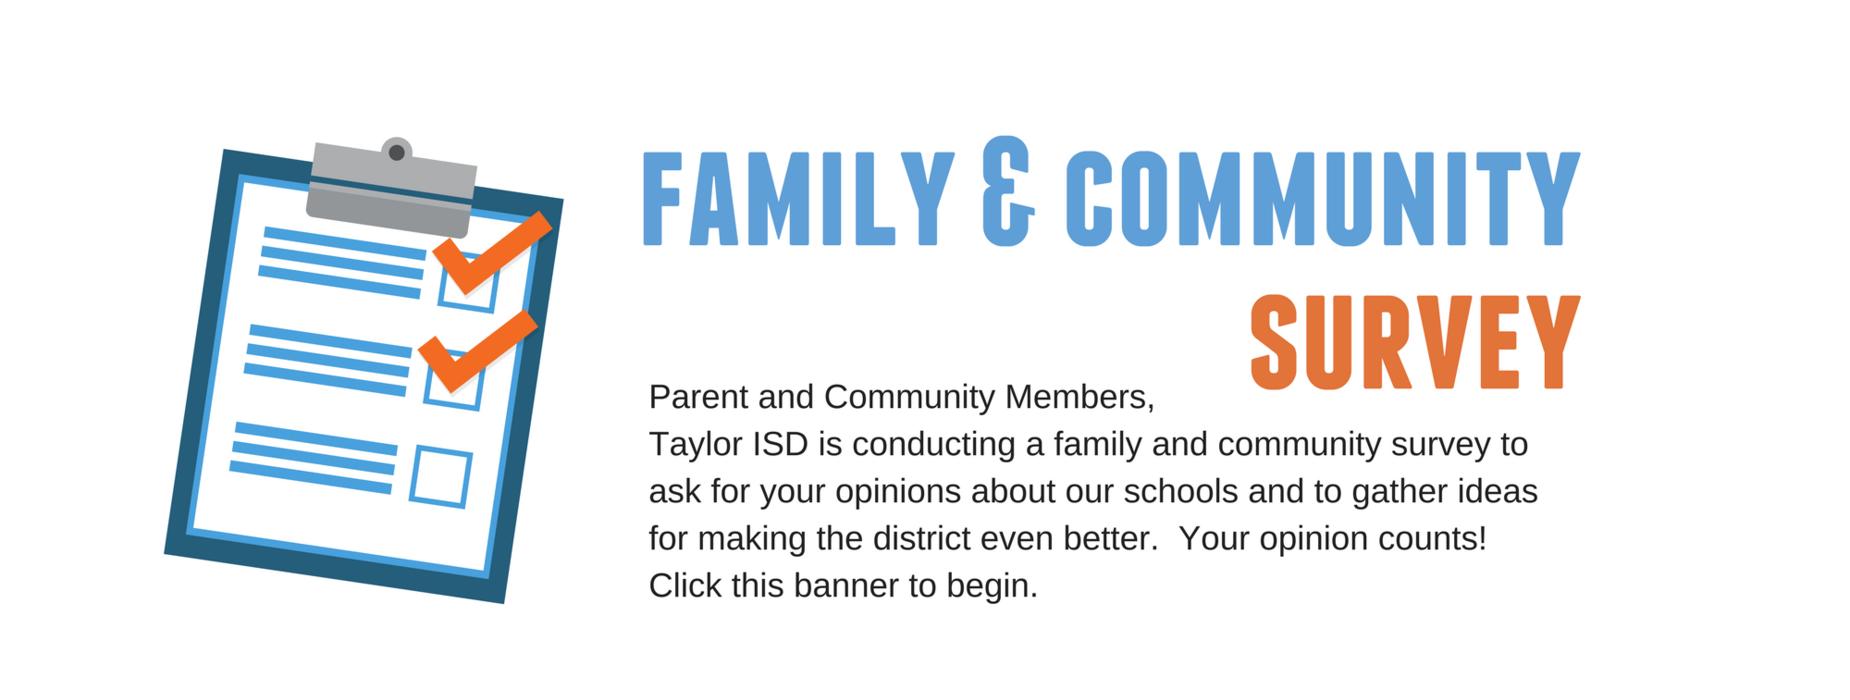 Family Community Survey